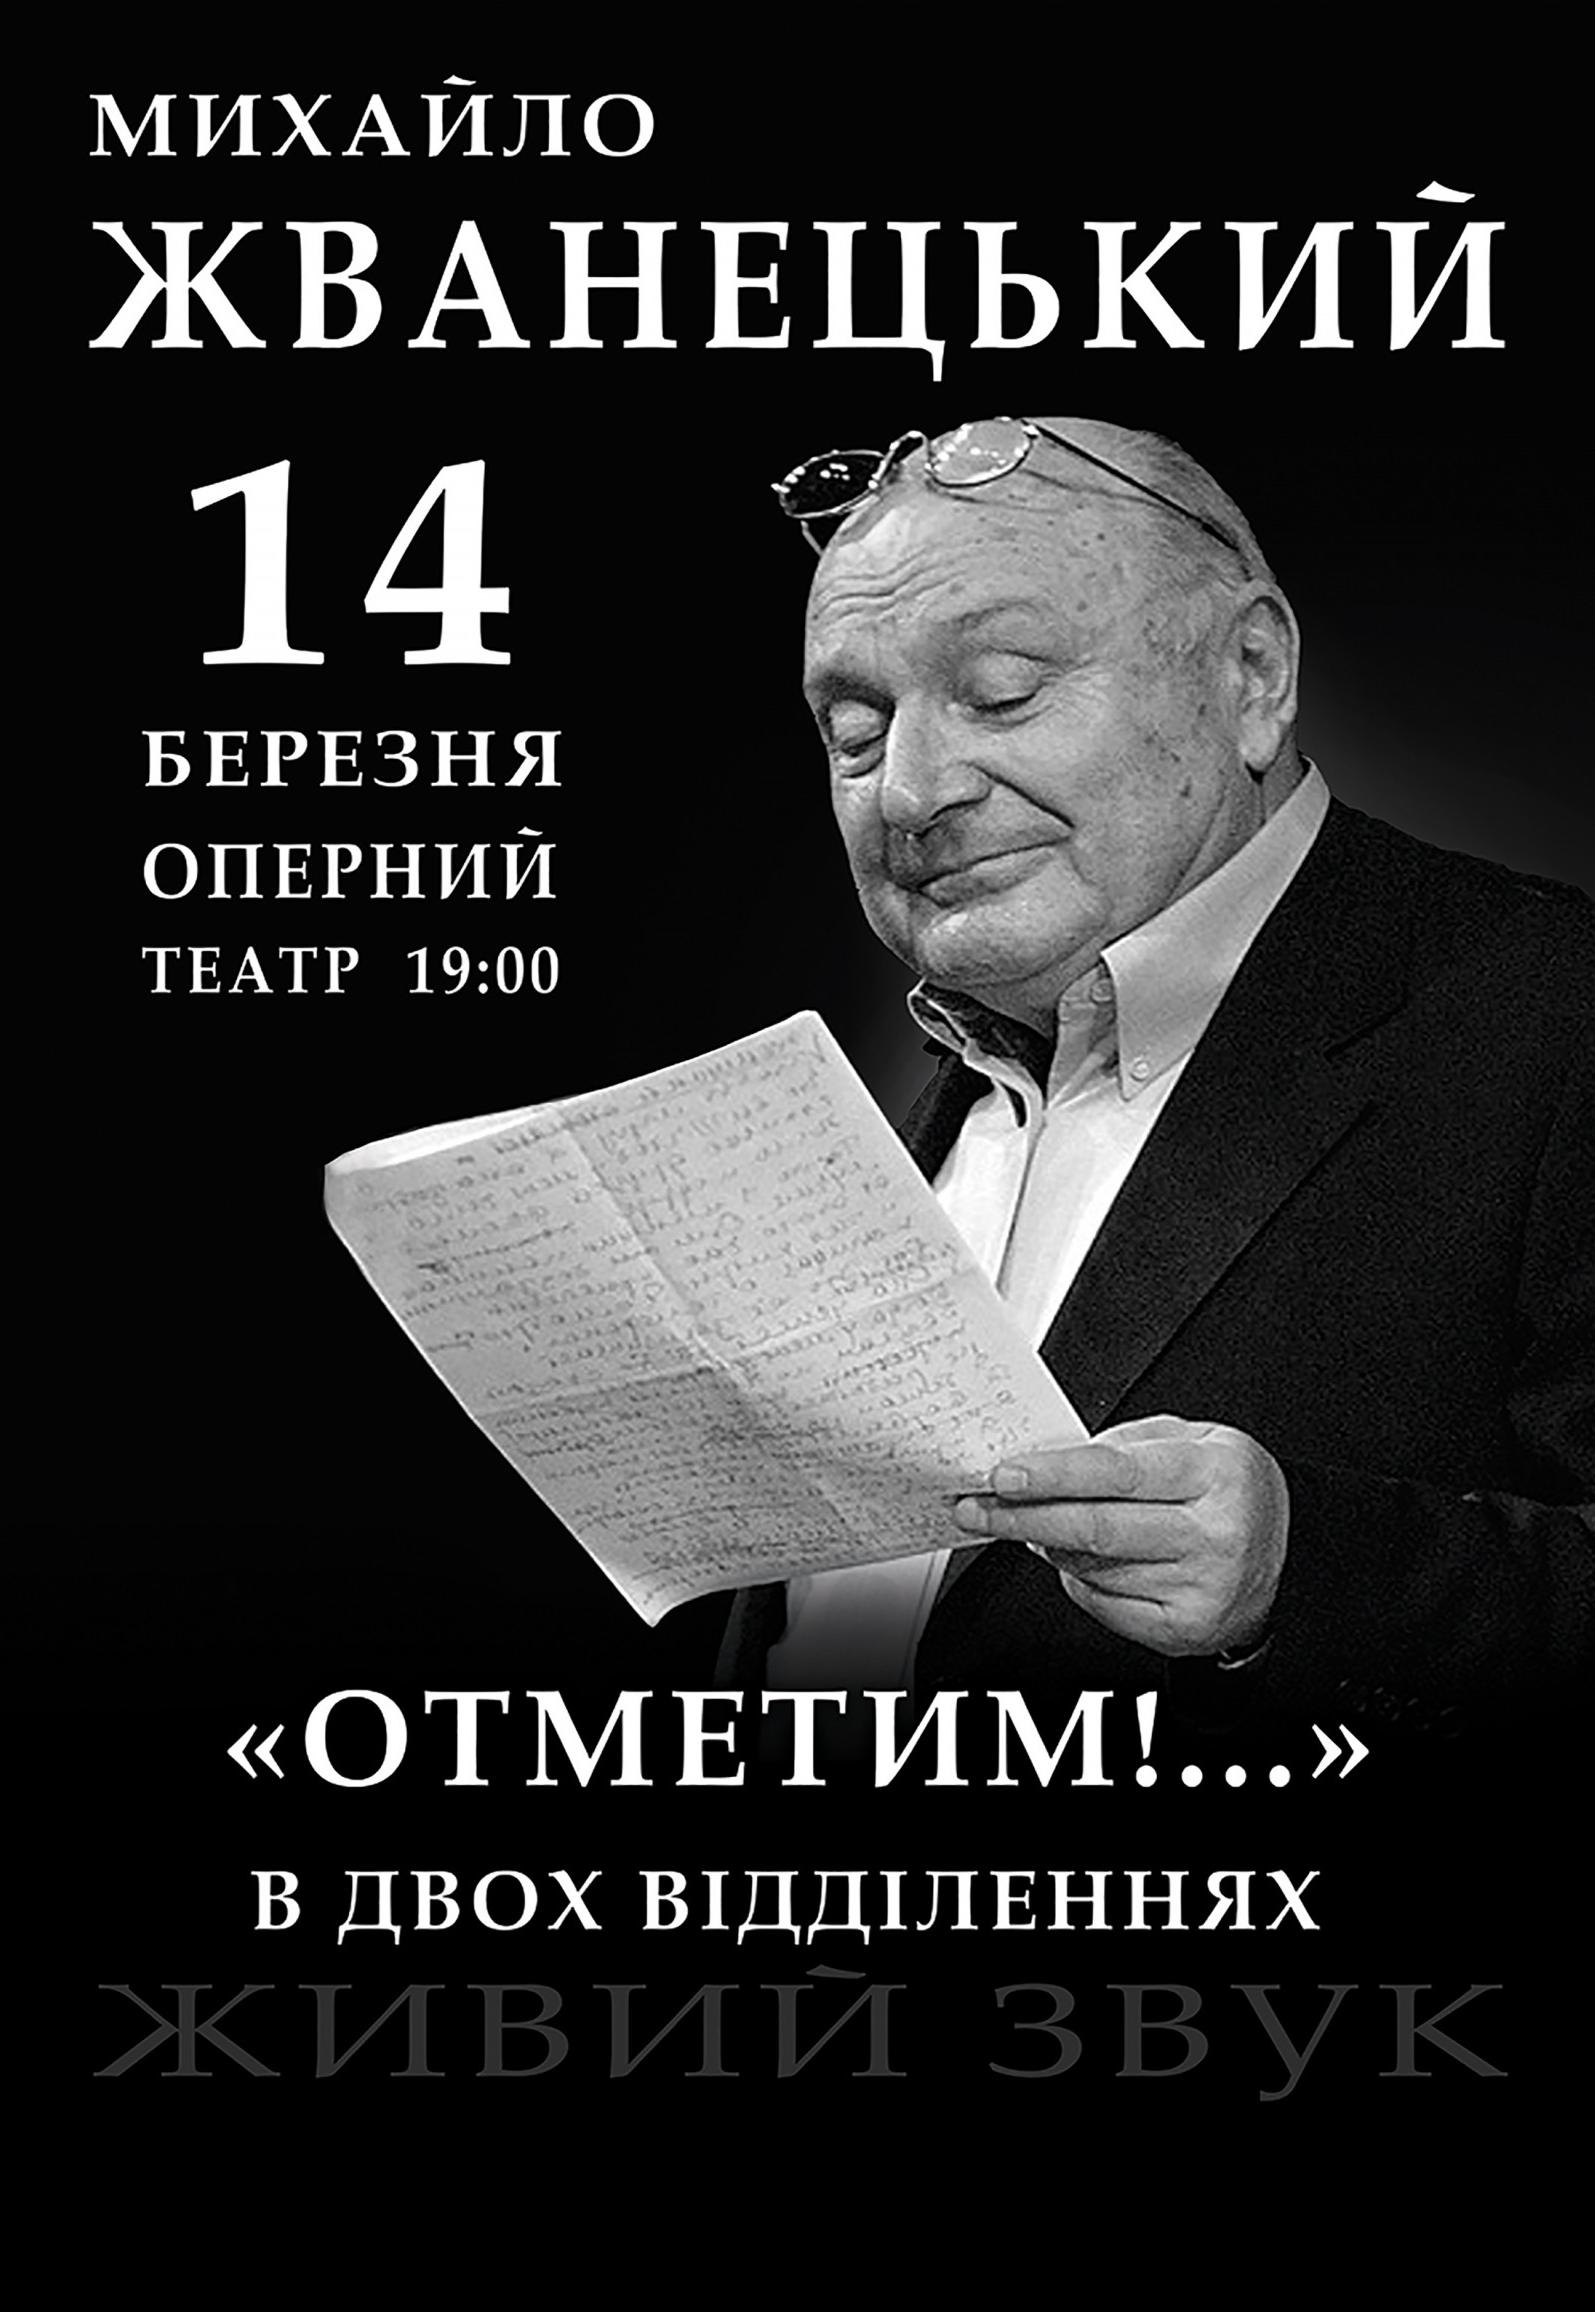 Жванецкий концерт билеты самара театры афиша на октябрь 2015